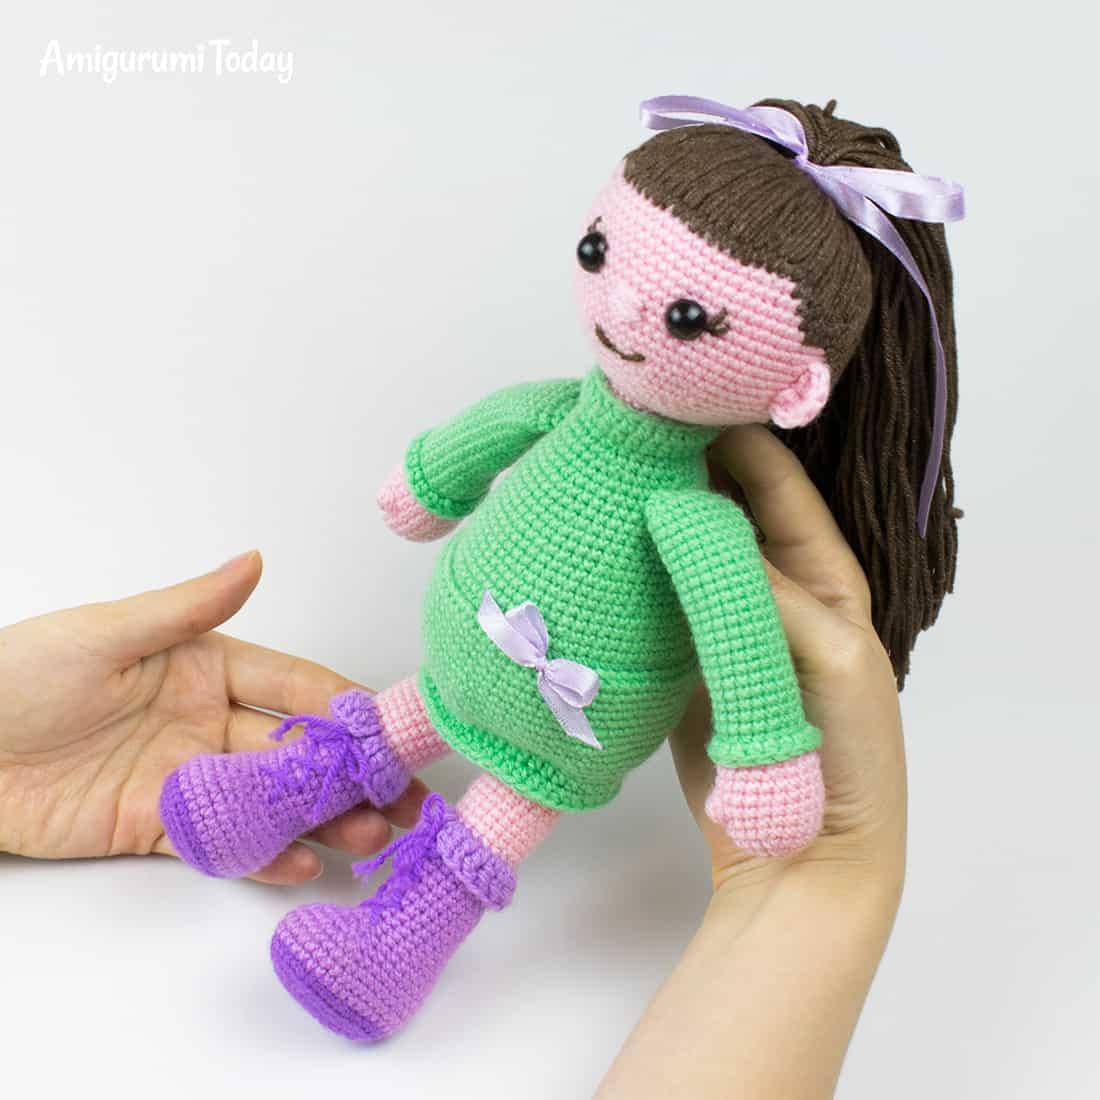 Lulu doll free amigurumi